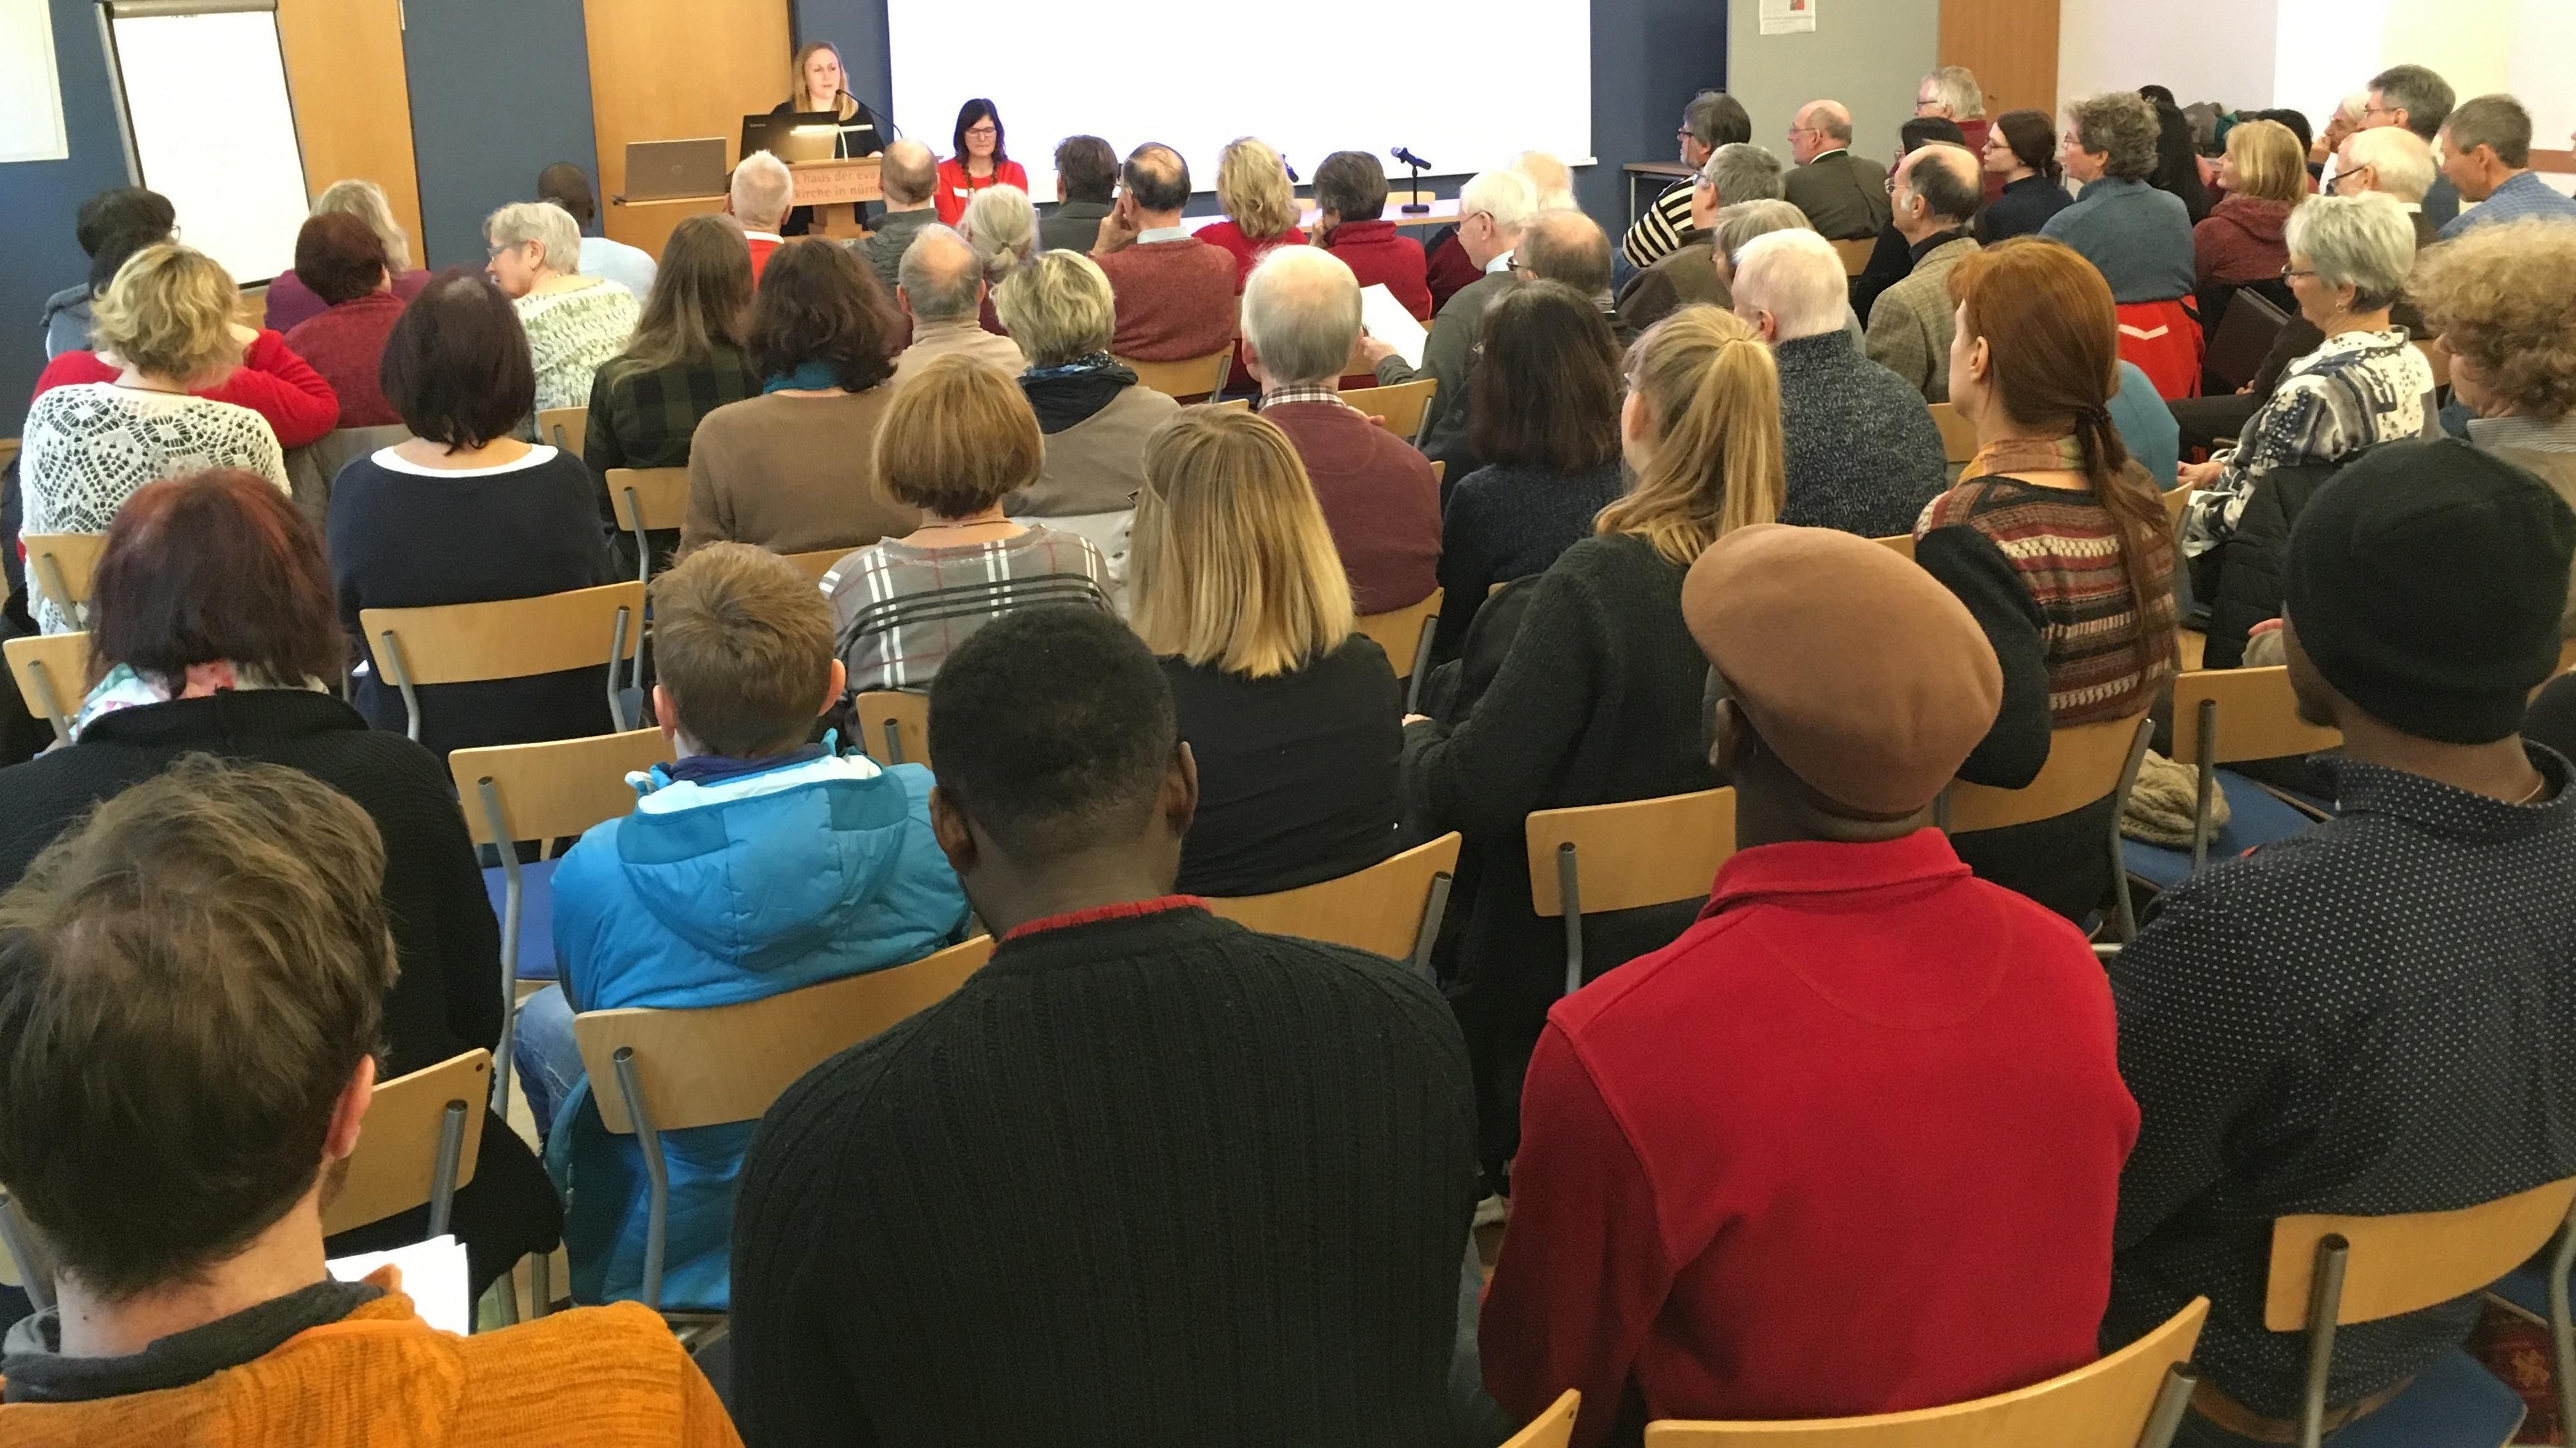 Zweiter Asylgipfel in Nürnberg